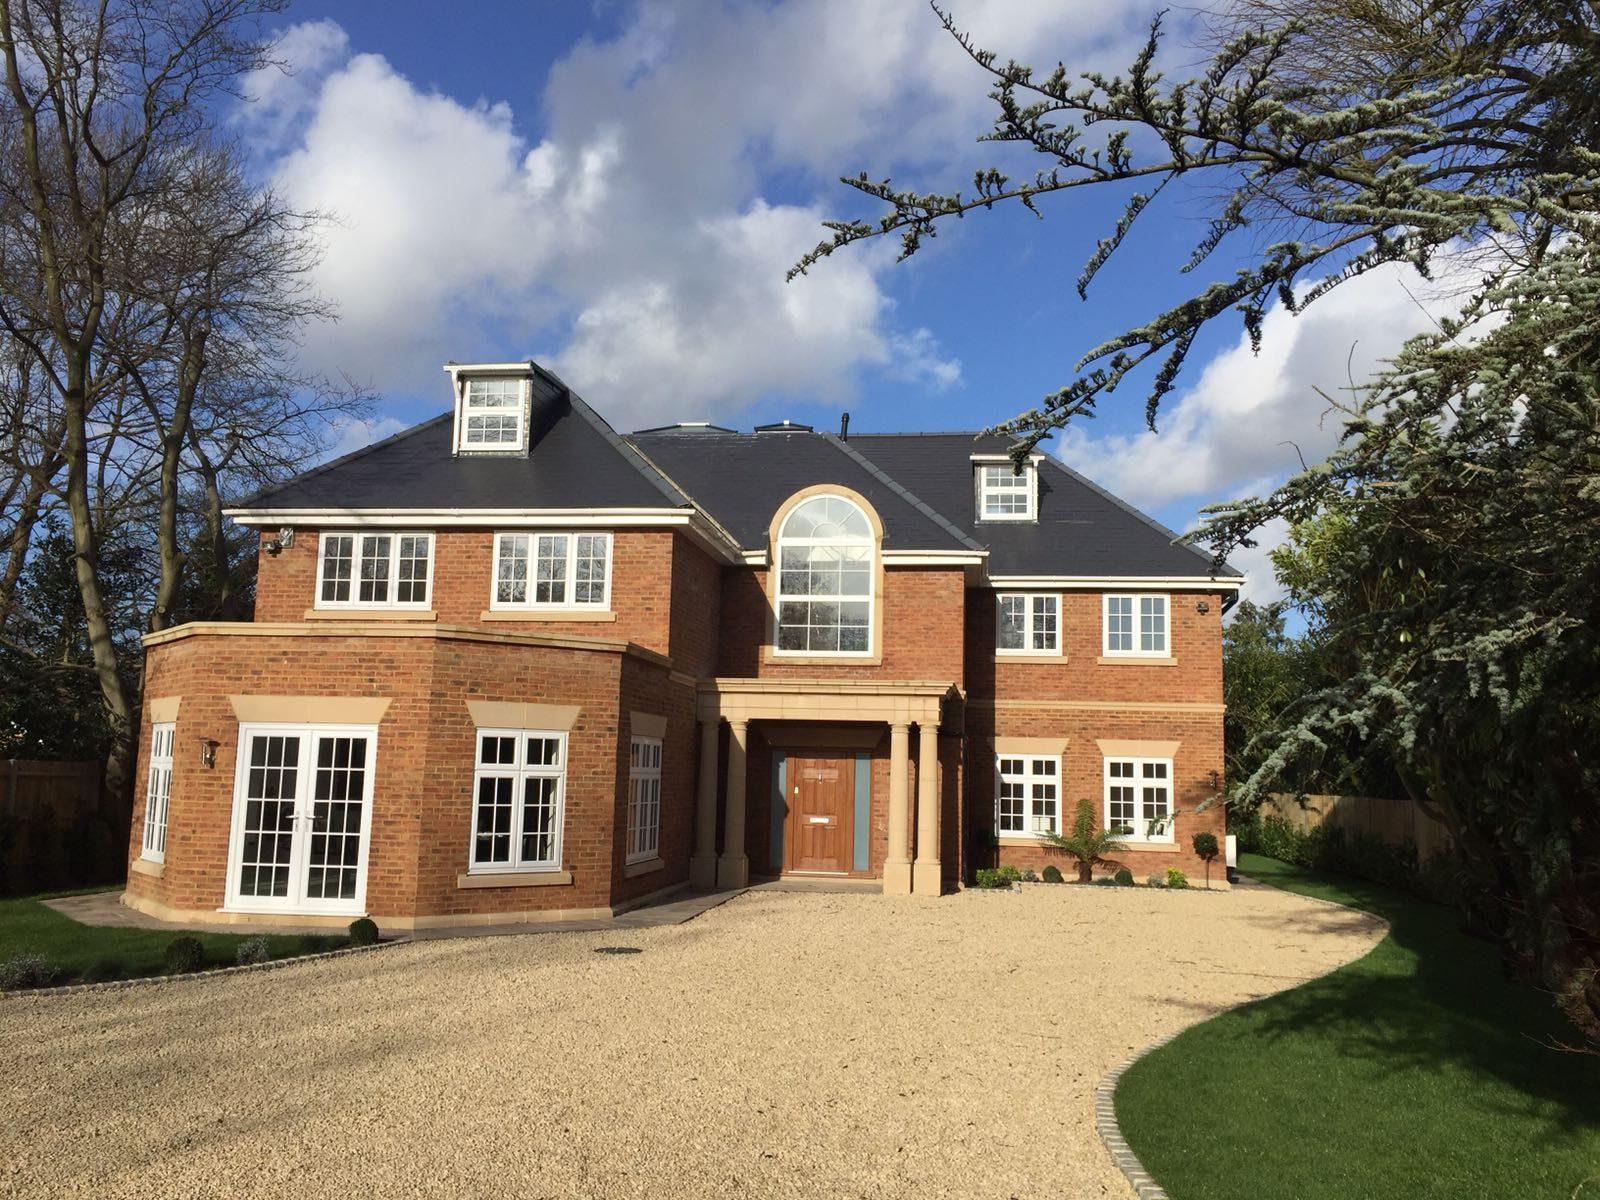 New Homes Farnham Common